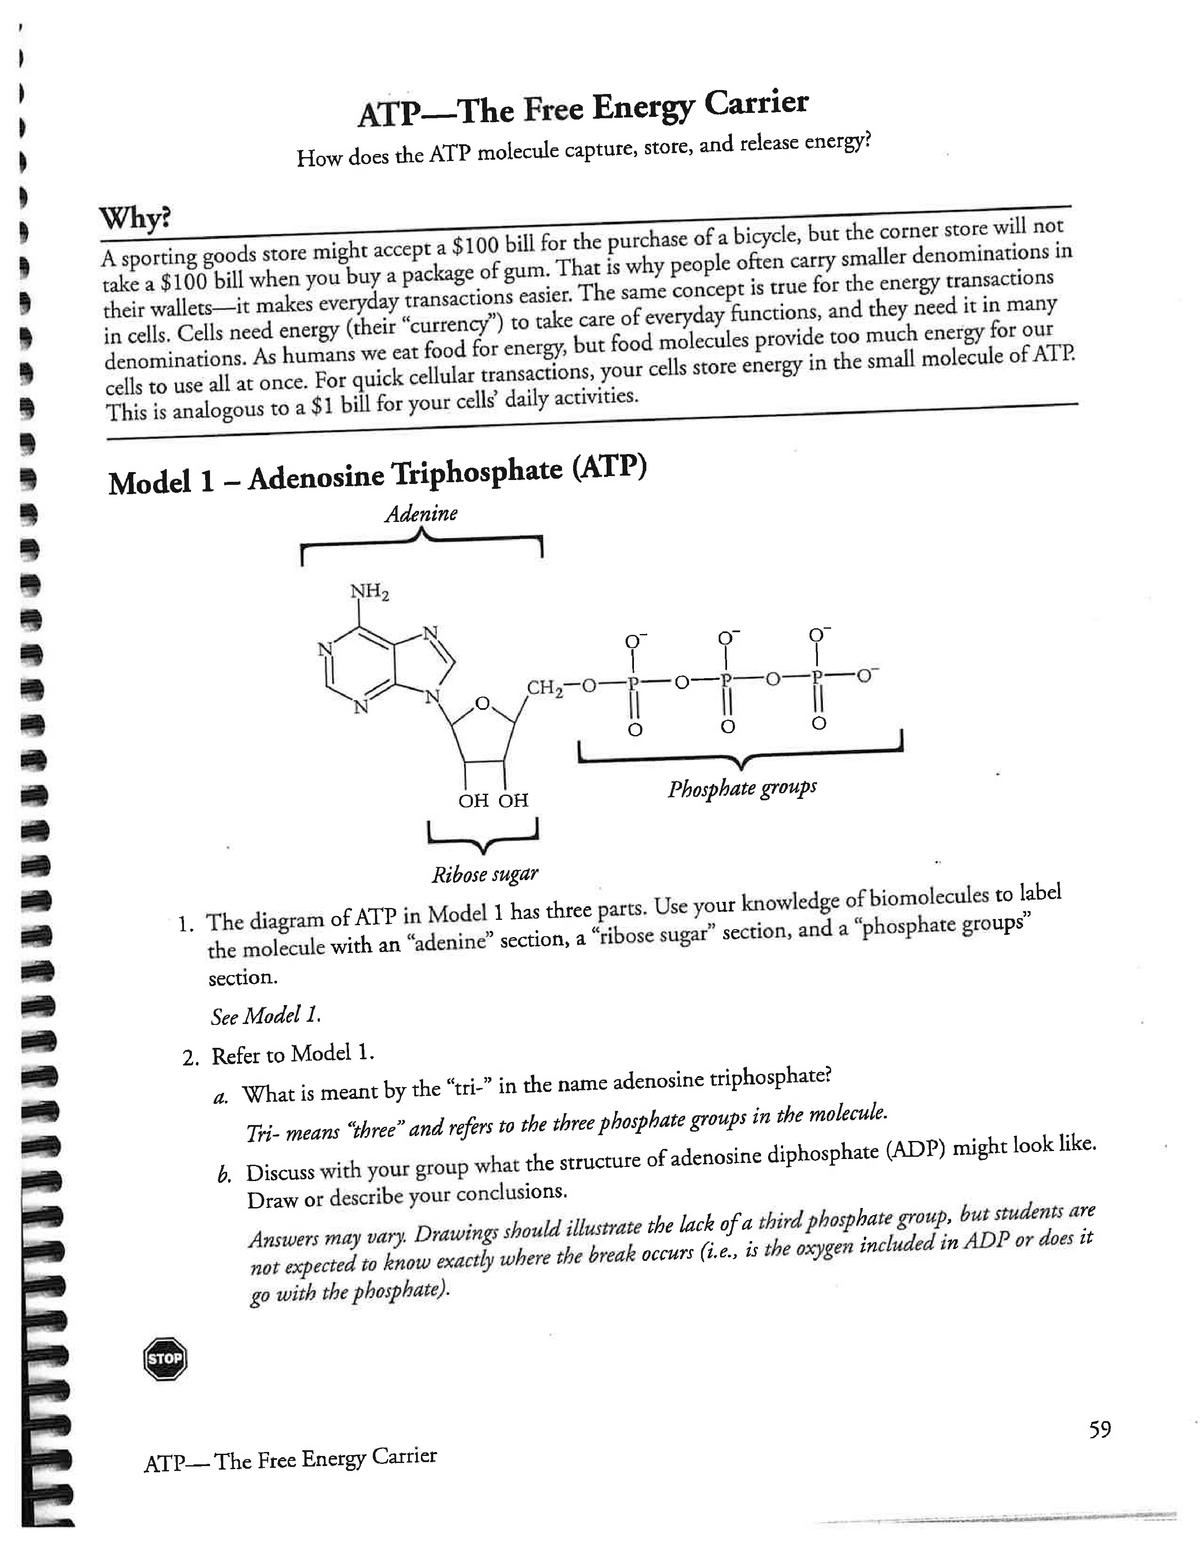 Pogil ATP Key - Answer key - BIO 121 - Oakton - StuDocu